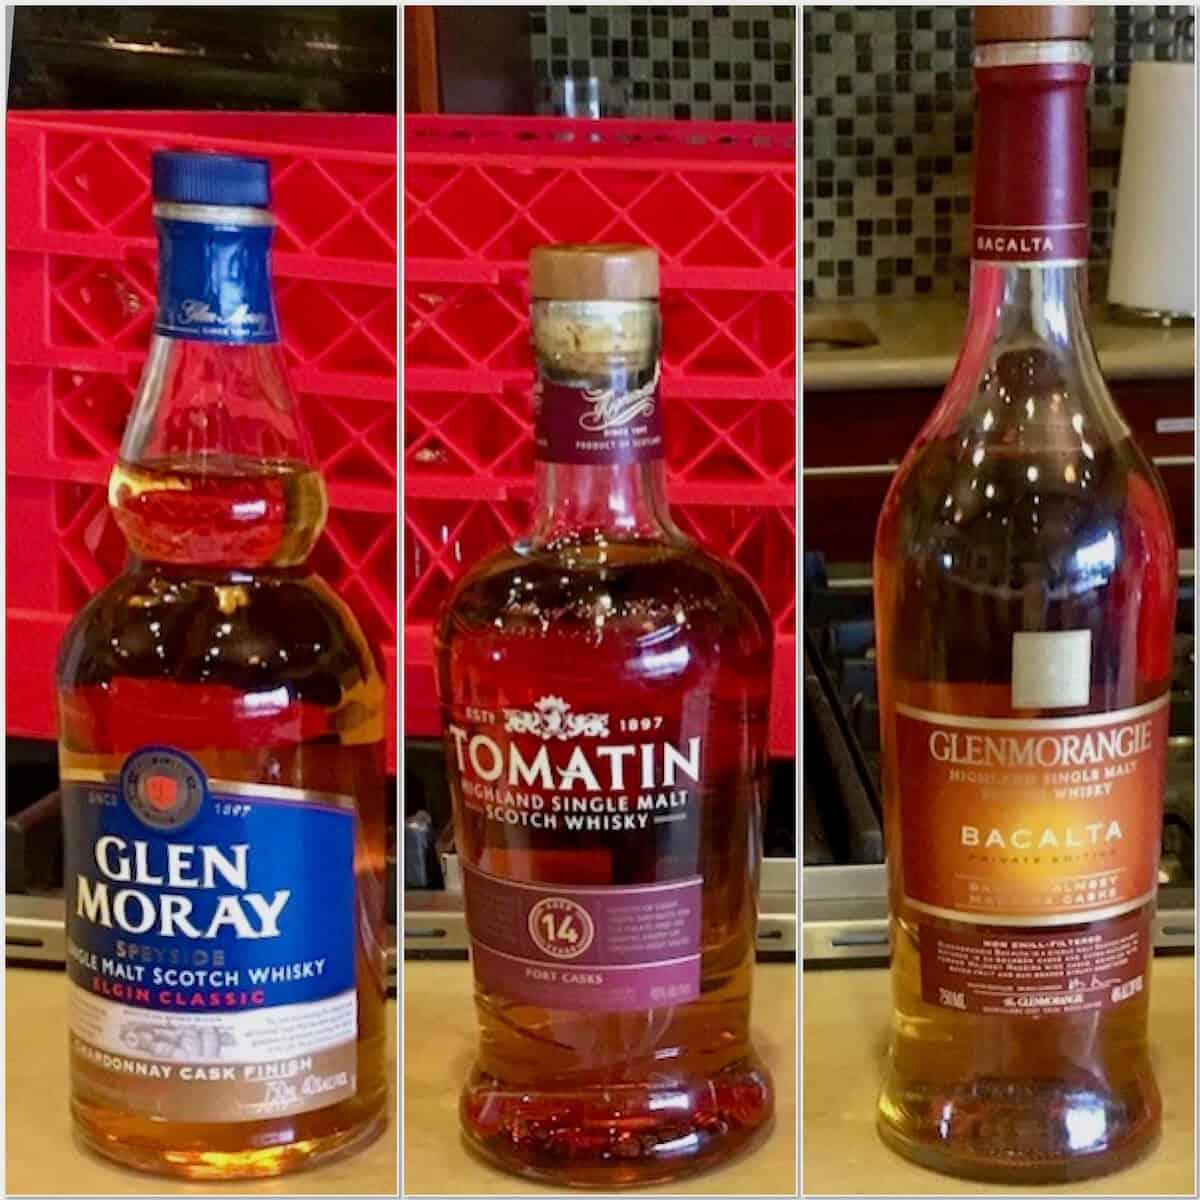 Collage of Glen Moray, Tomatin, and Glenmorangie scotch bottles on a counter.